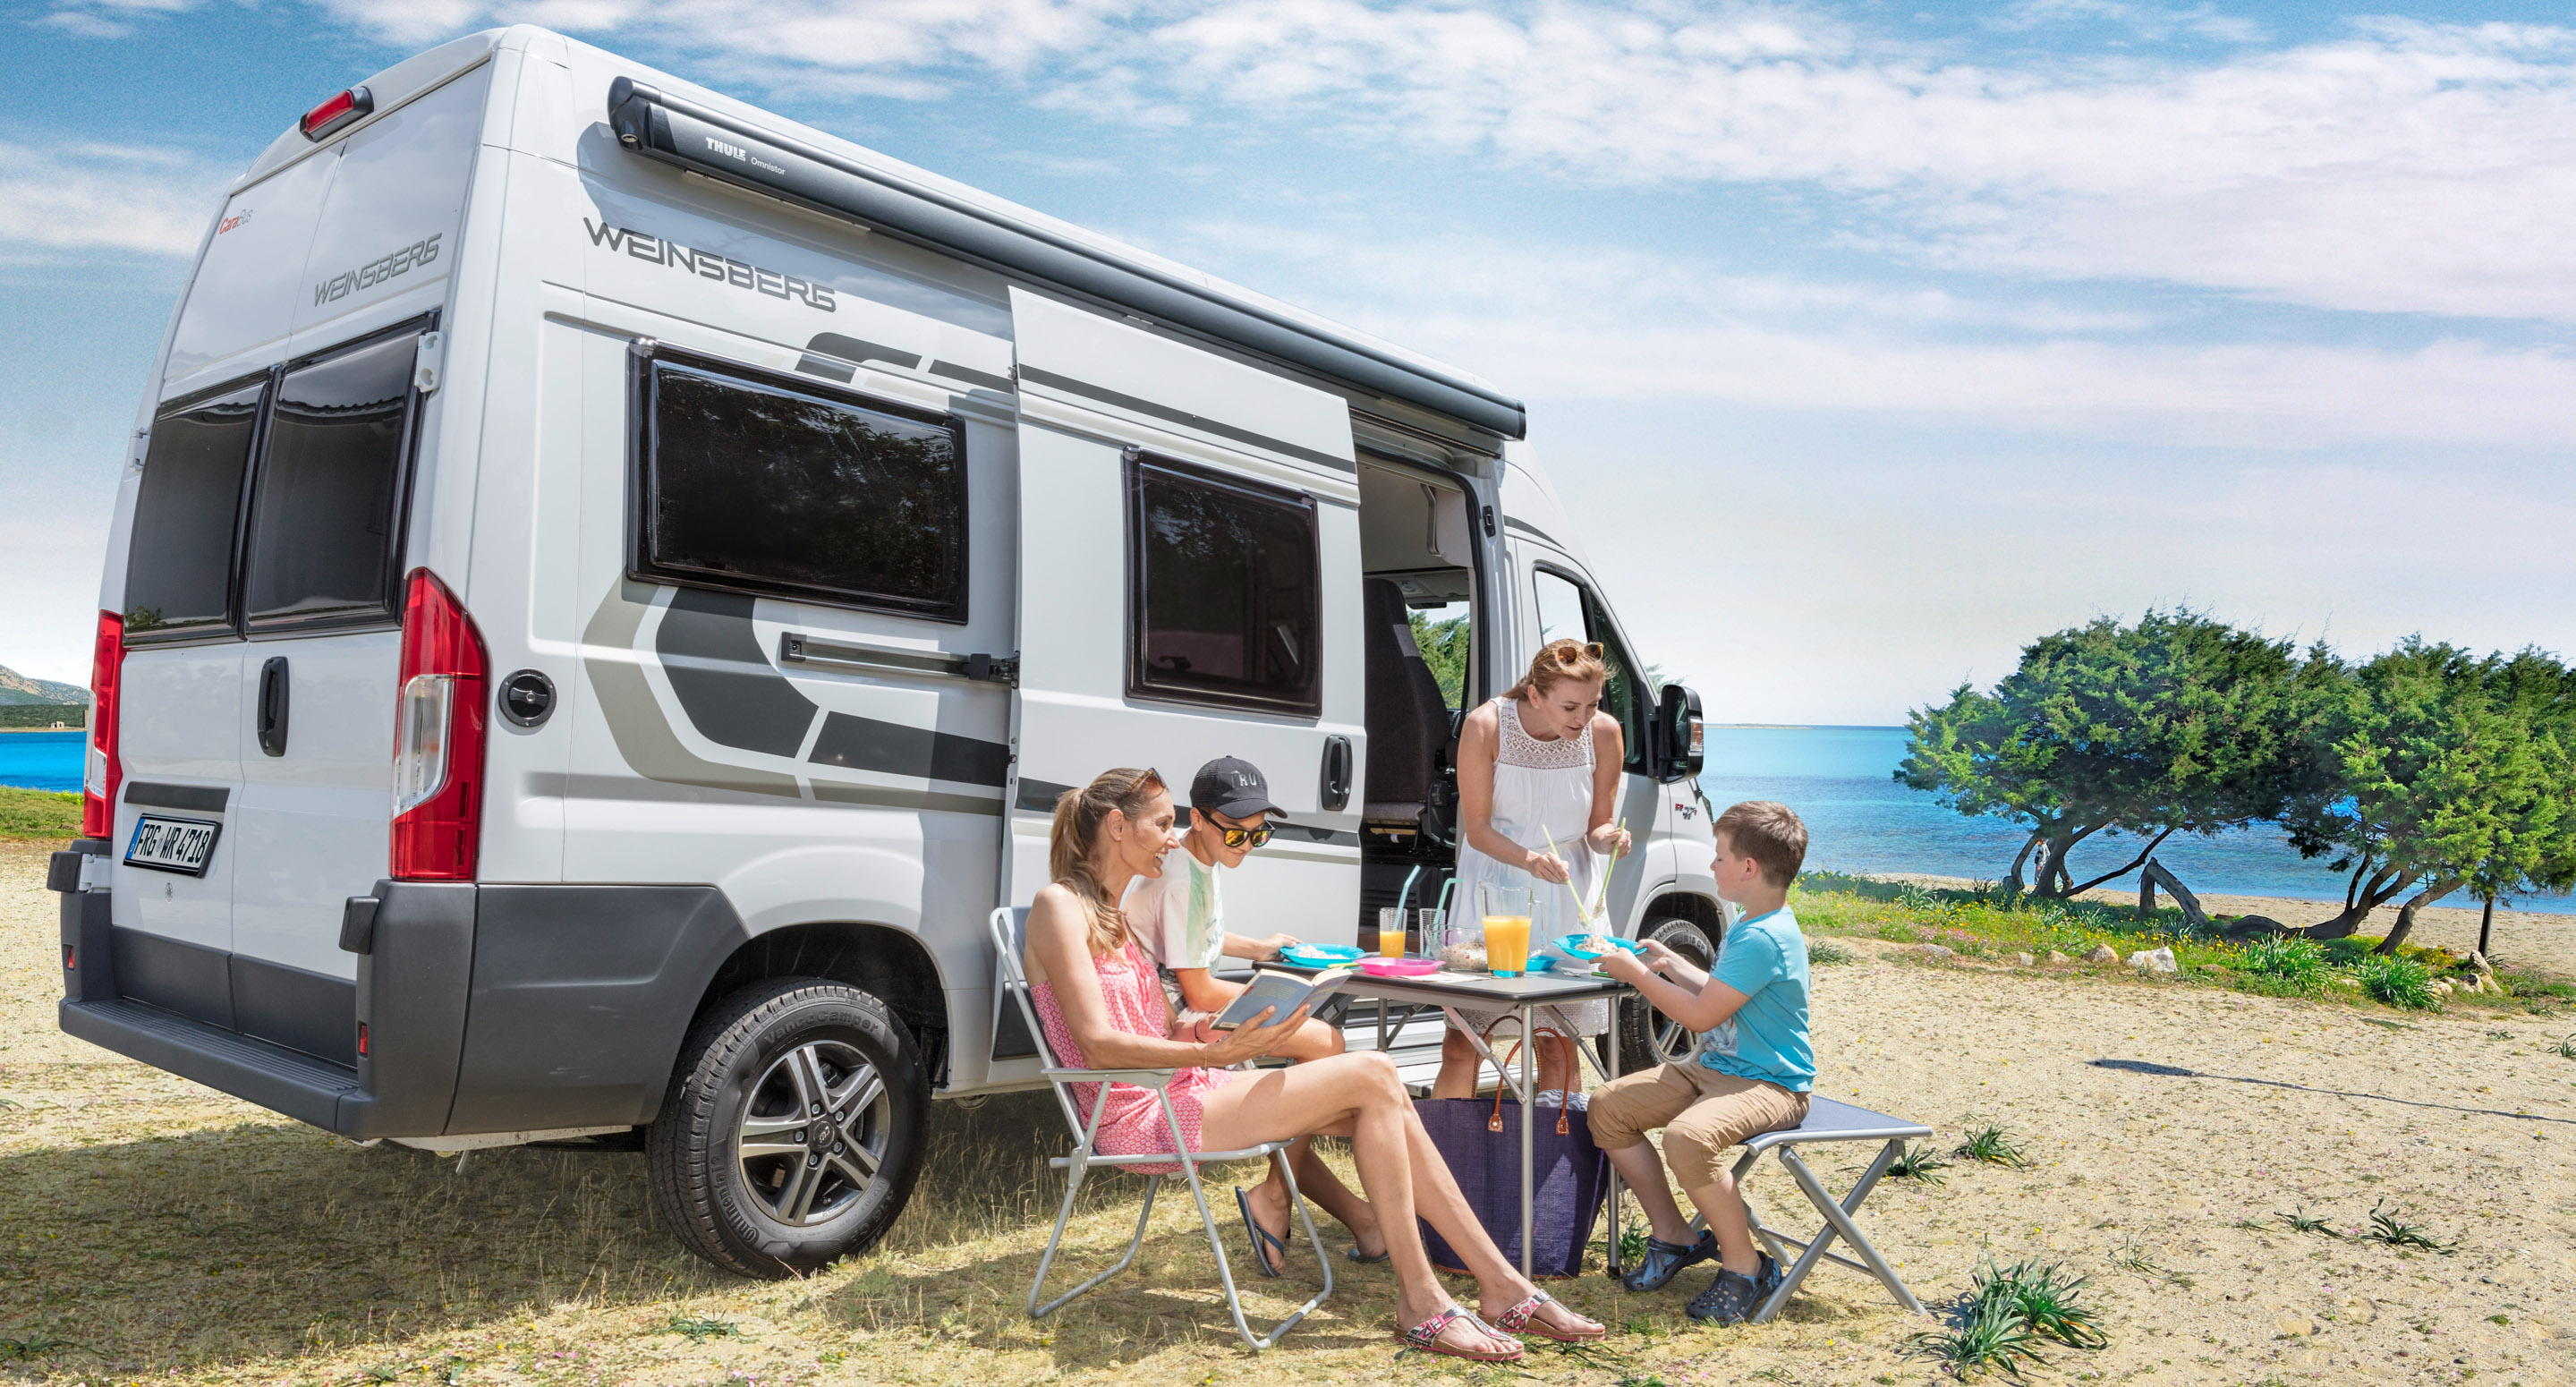 ktg-weinsberg-2017-2018-carabus-models-1925-2-rz_72dpi_lowres